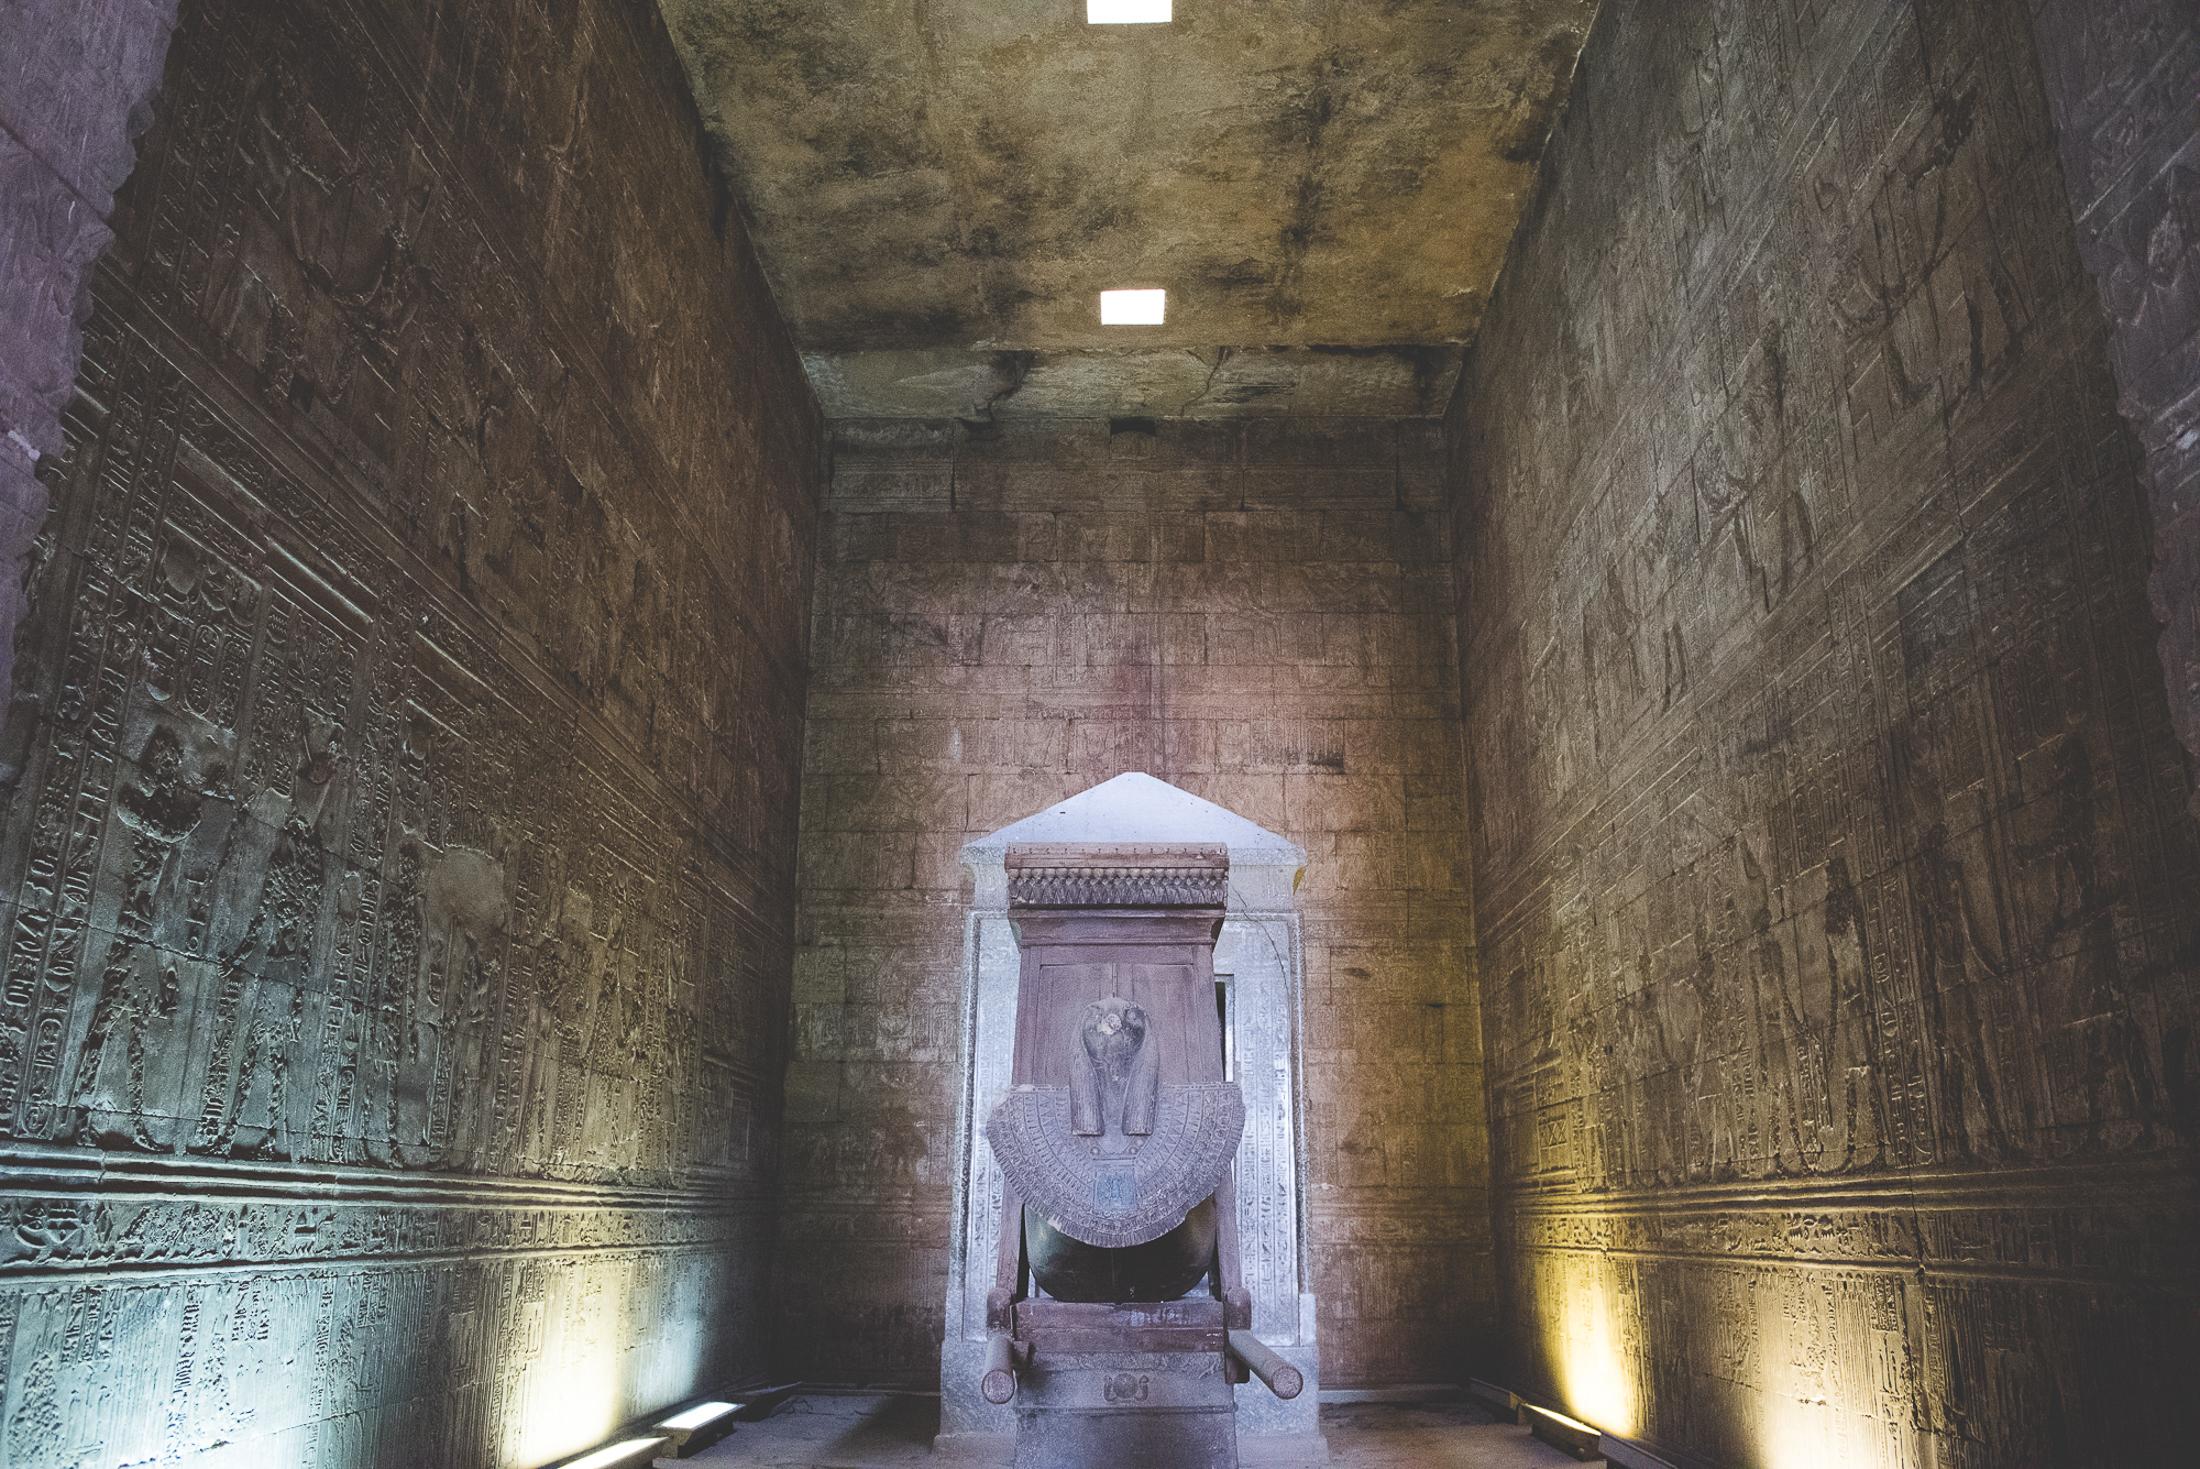 thetravelhub_egypt14.jpg